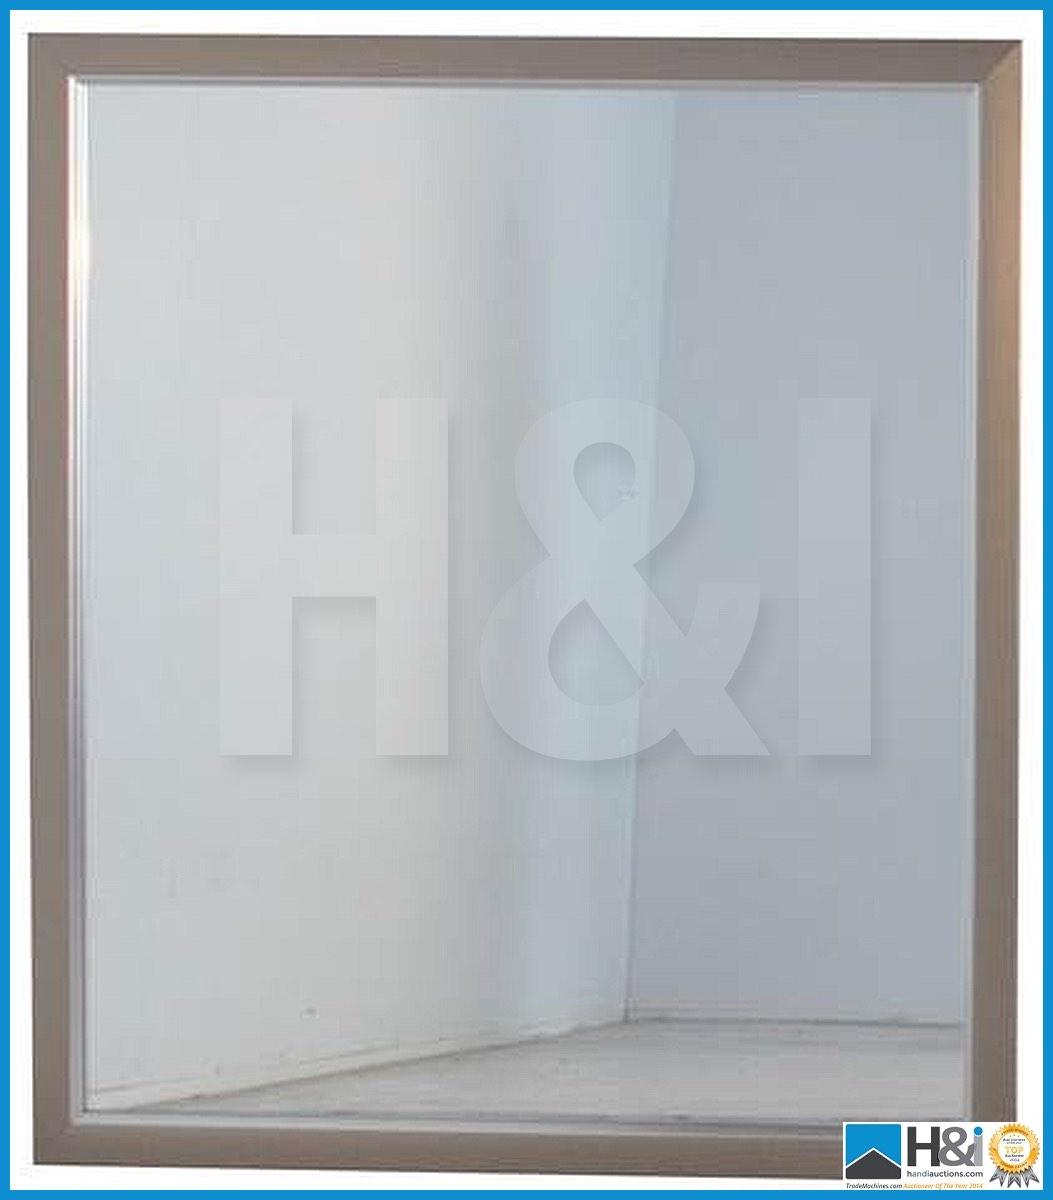 Lot 7 - Stunning black walnut bedroom furniture set comprising: 2-door wardrobe - H 193cm x W 110cm